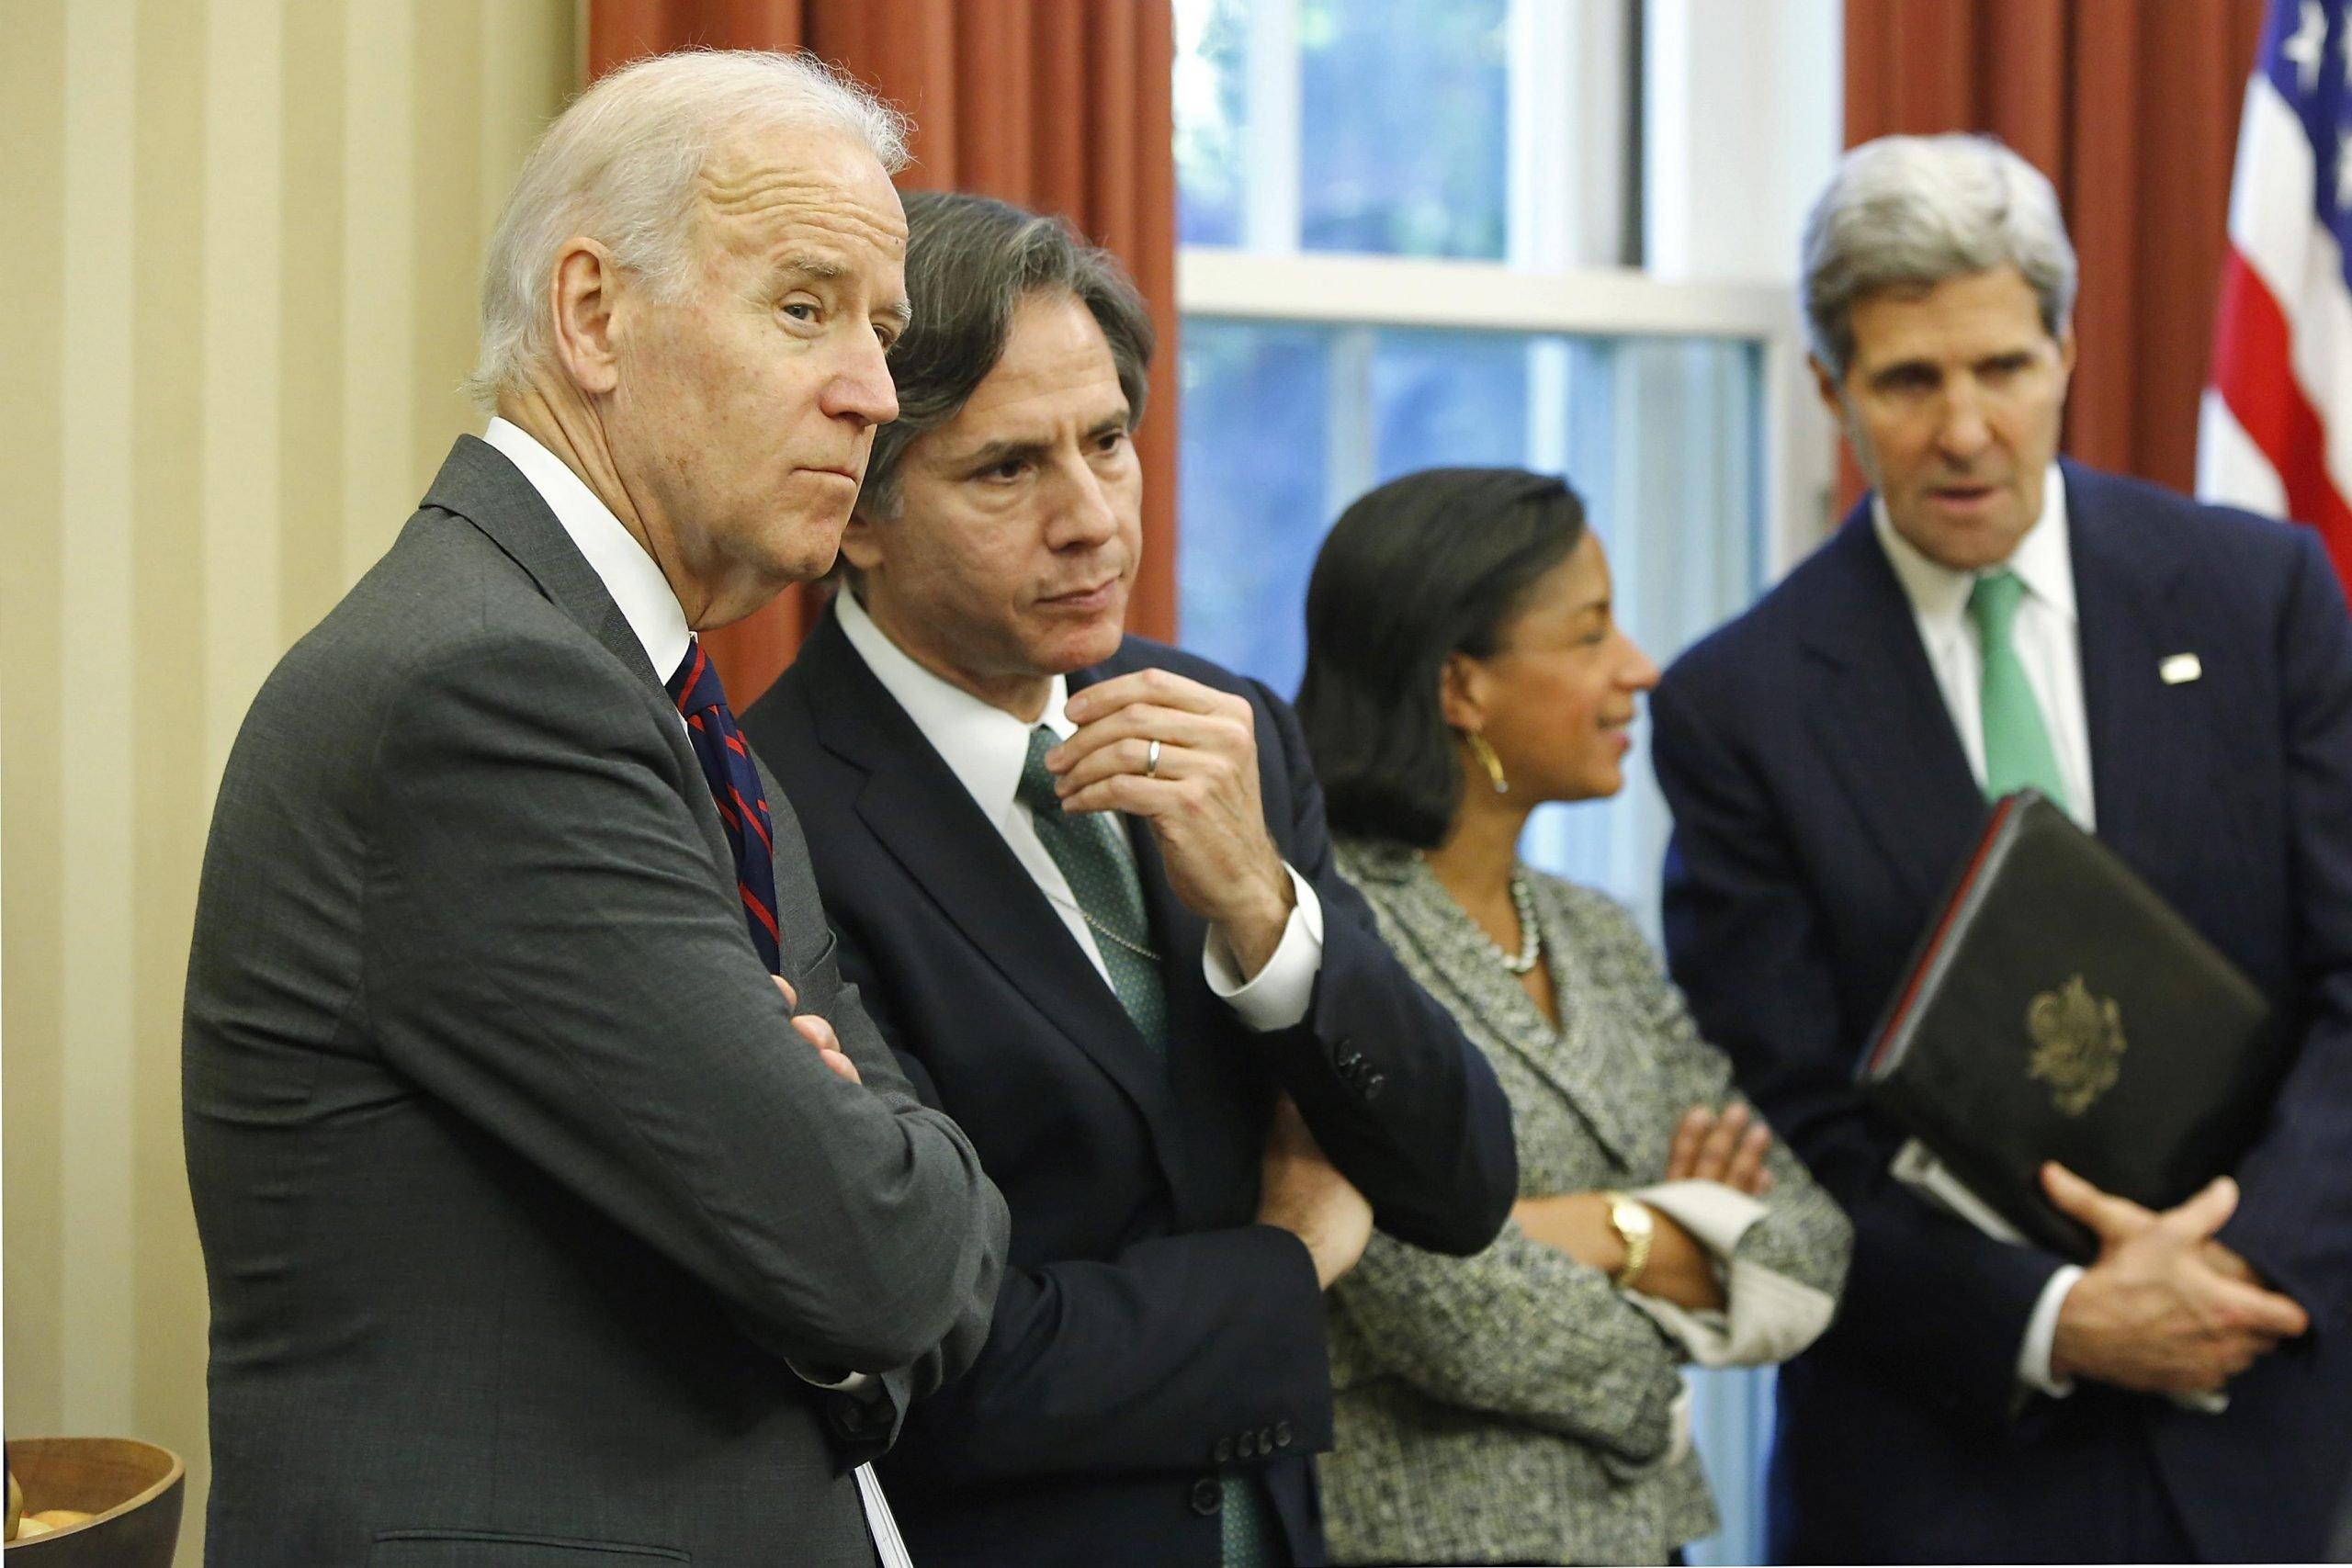 US president Joe Biden, Secretary of State Antony Blinken, Domestic policy czar Susan Rice, and John Kerry in the white house's Oval Office.